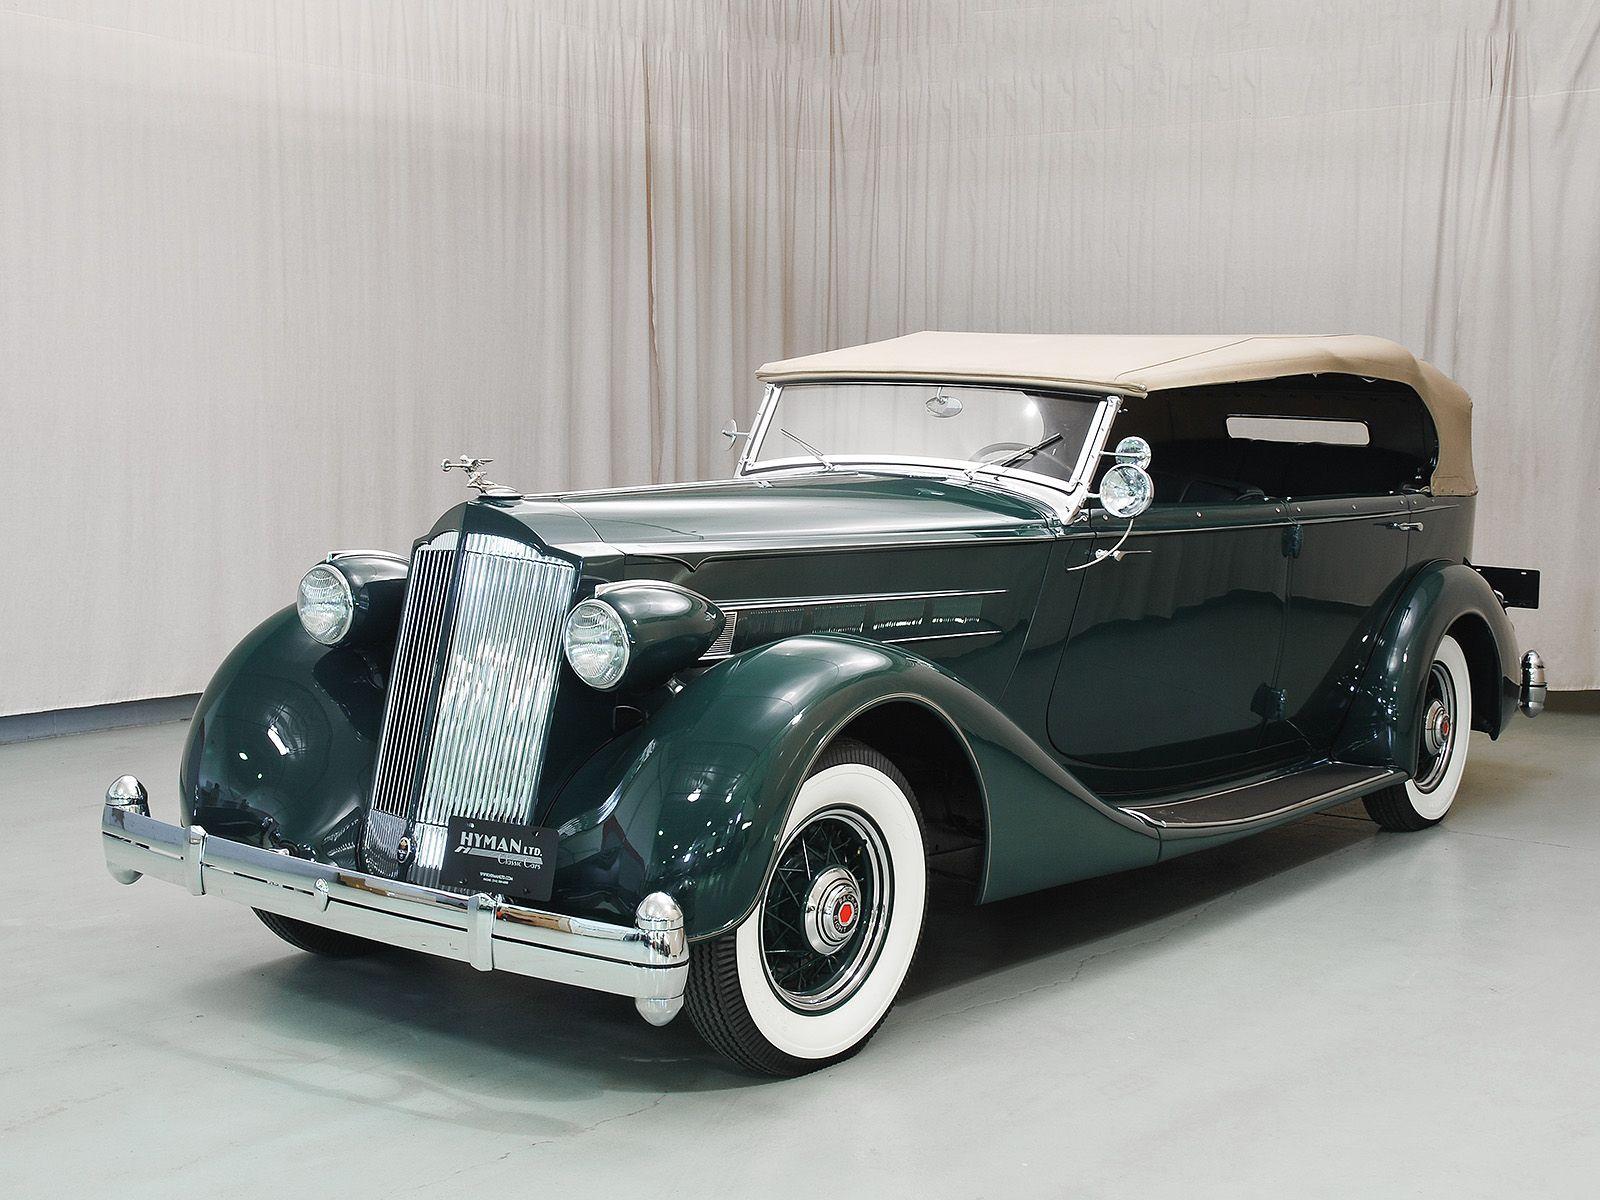 1936 Packard Eight Phaeton - Hyman Ltd. Classic Cars. Formerly ...